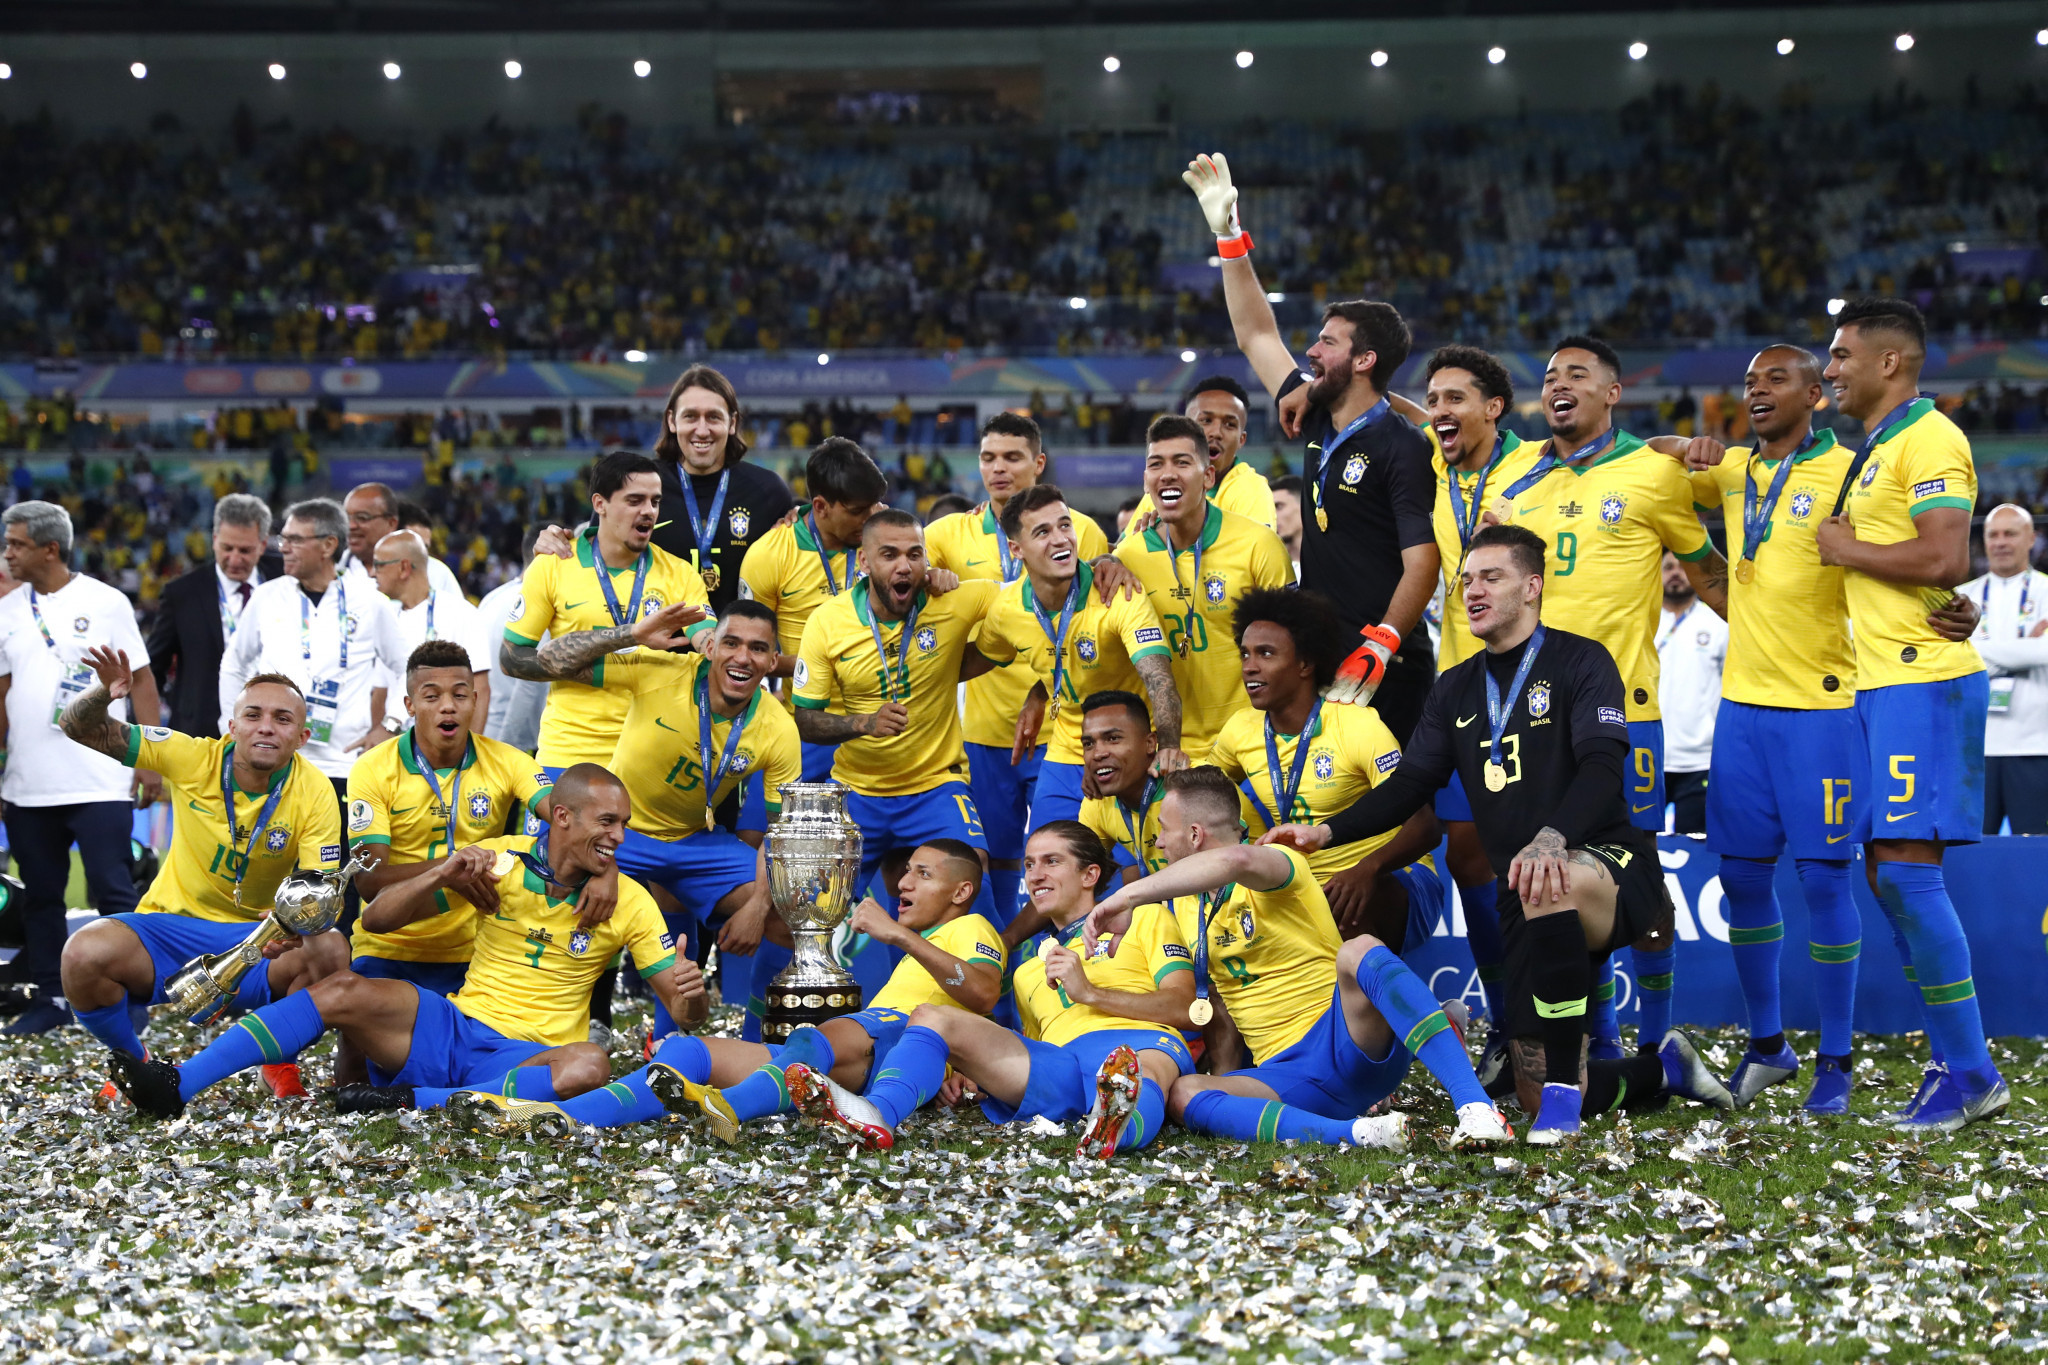 Hosts Brazil defeat Peru to win ninth Copa América title